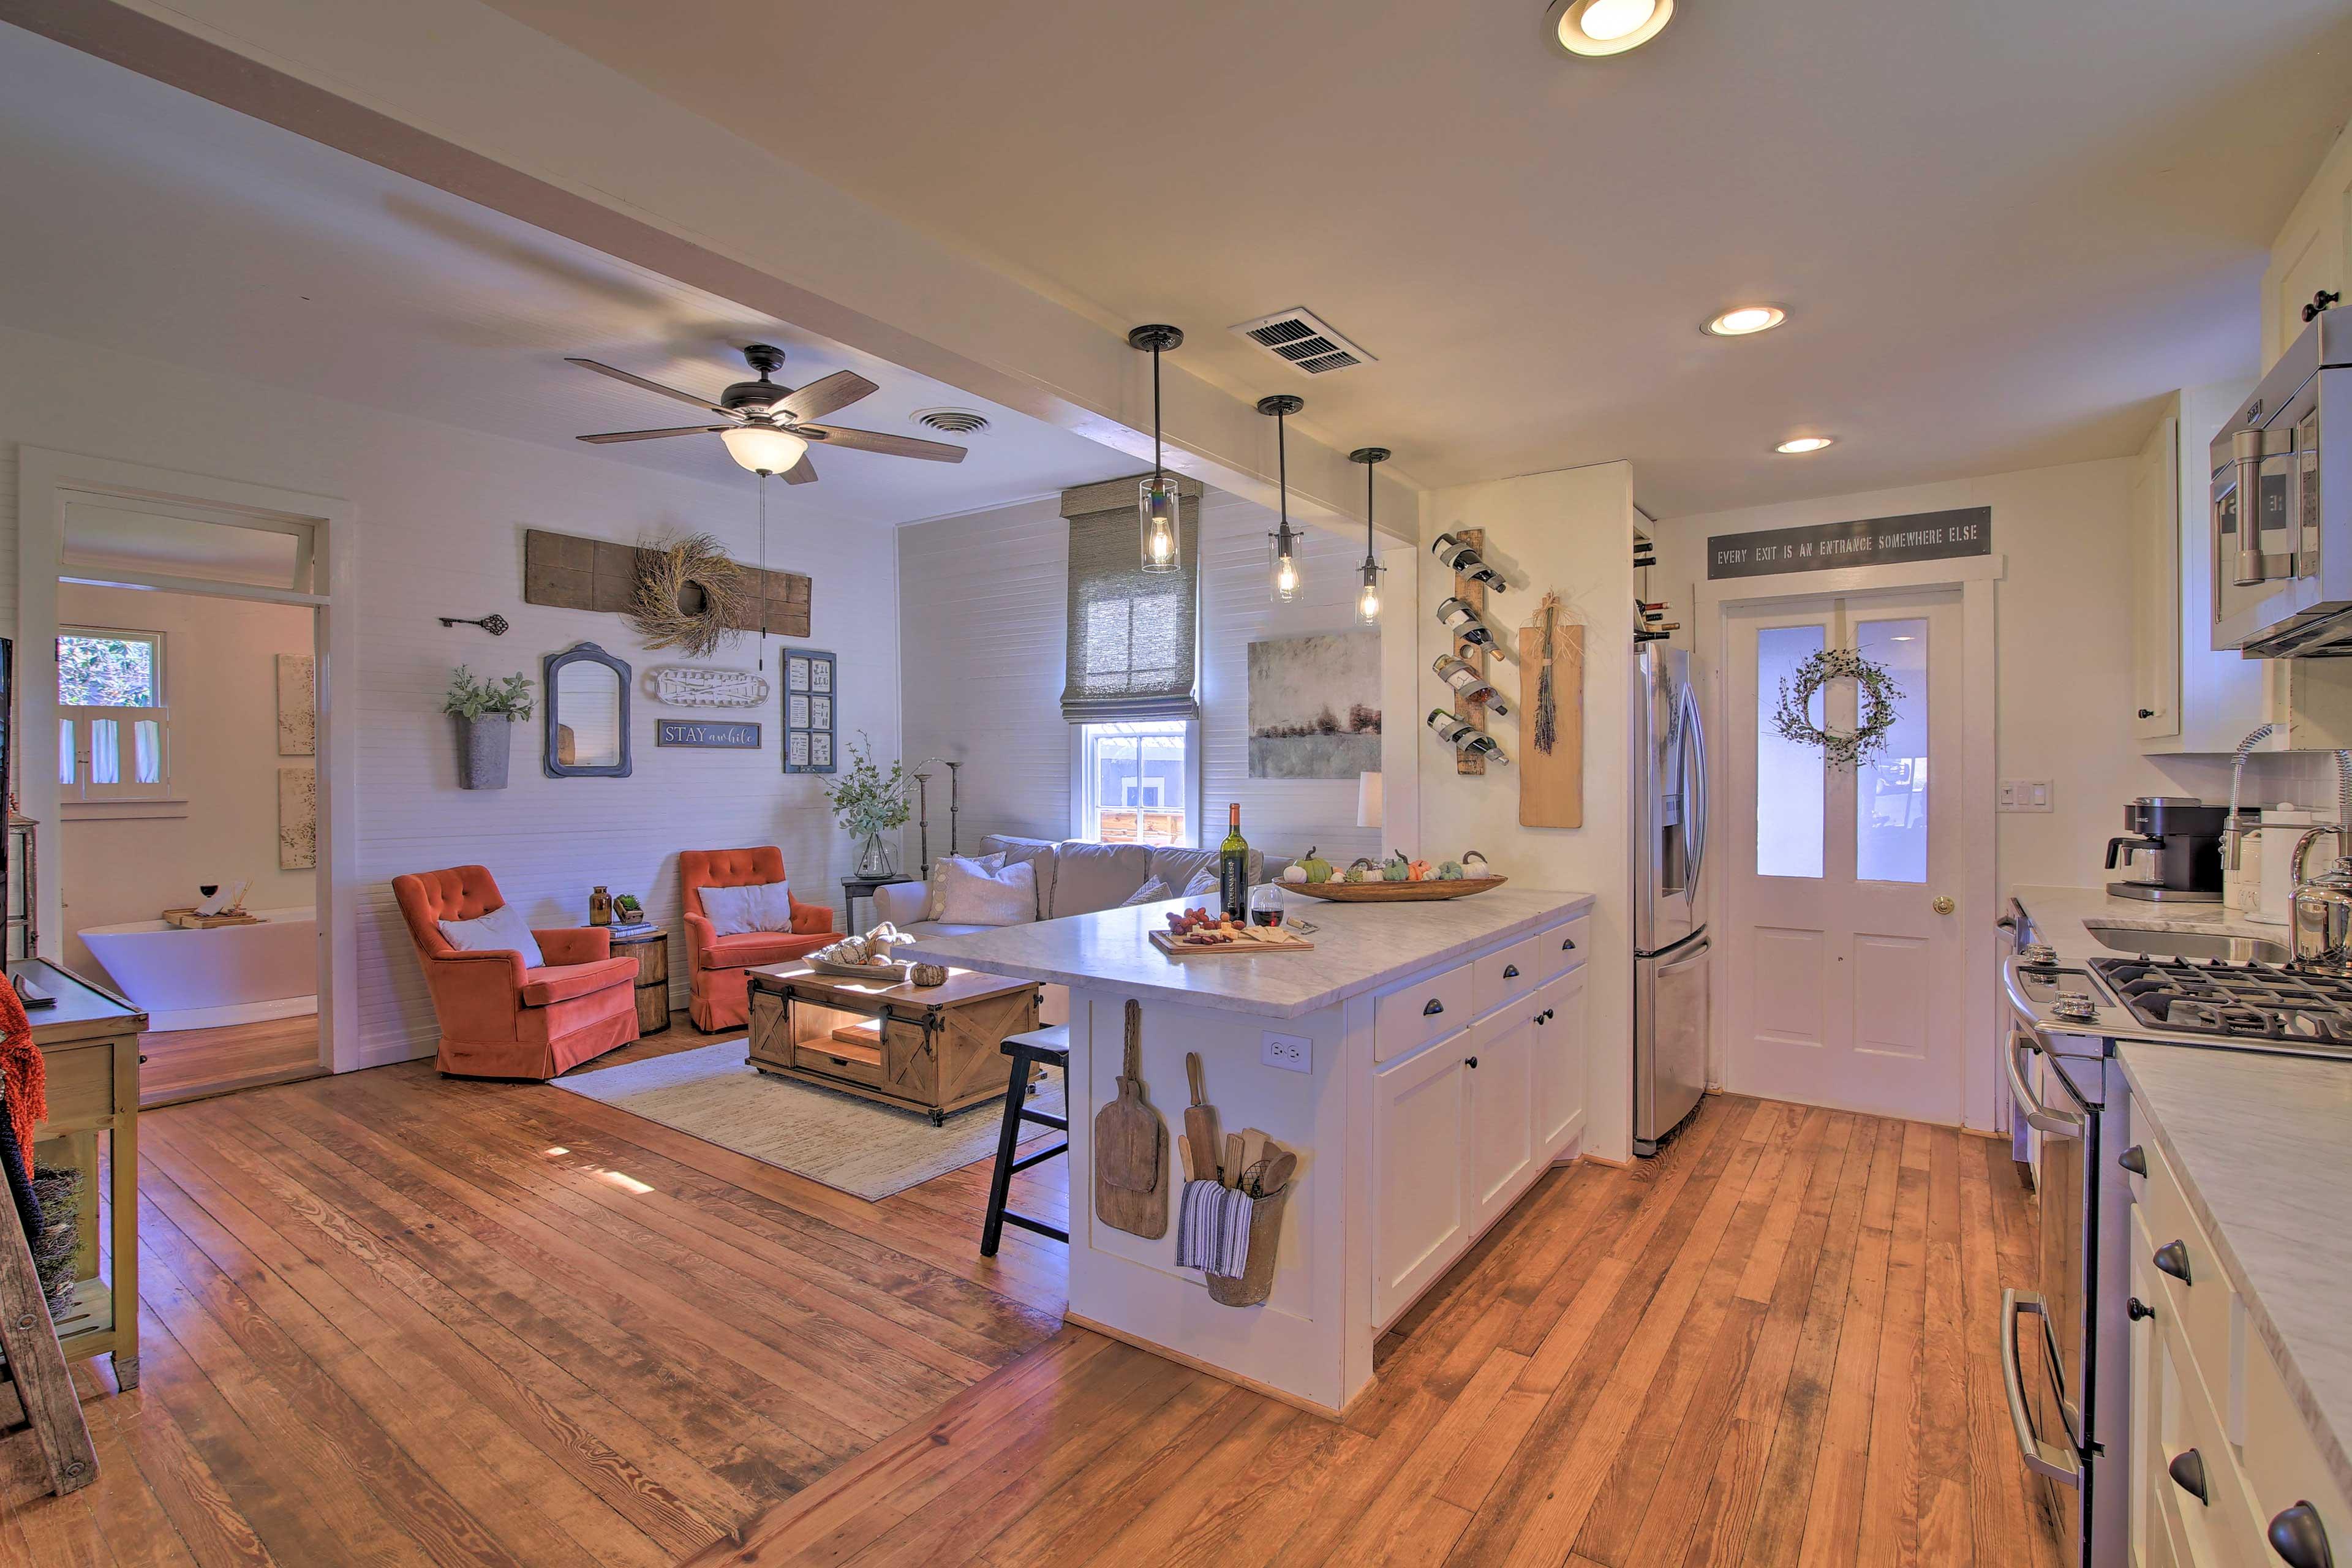 Kitchen | Dishware/Flatware | Keurig/Drip Coffee Maker